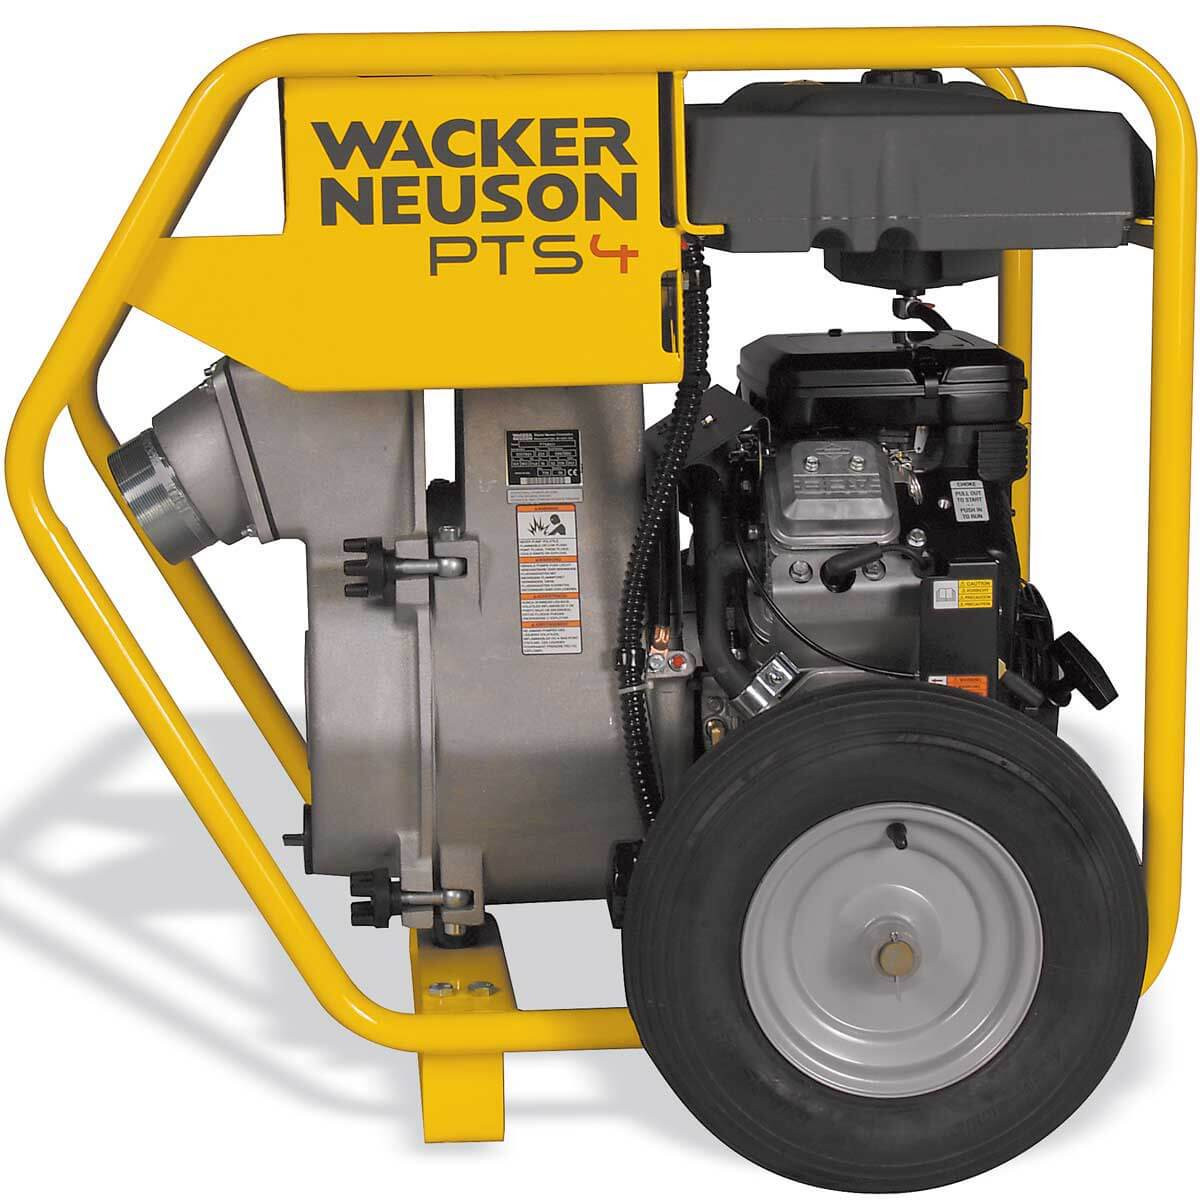 PTS4V Wacker Neuson Centrifugal Trash Pump